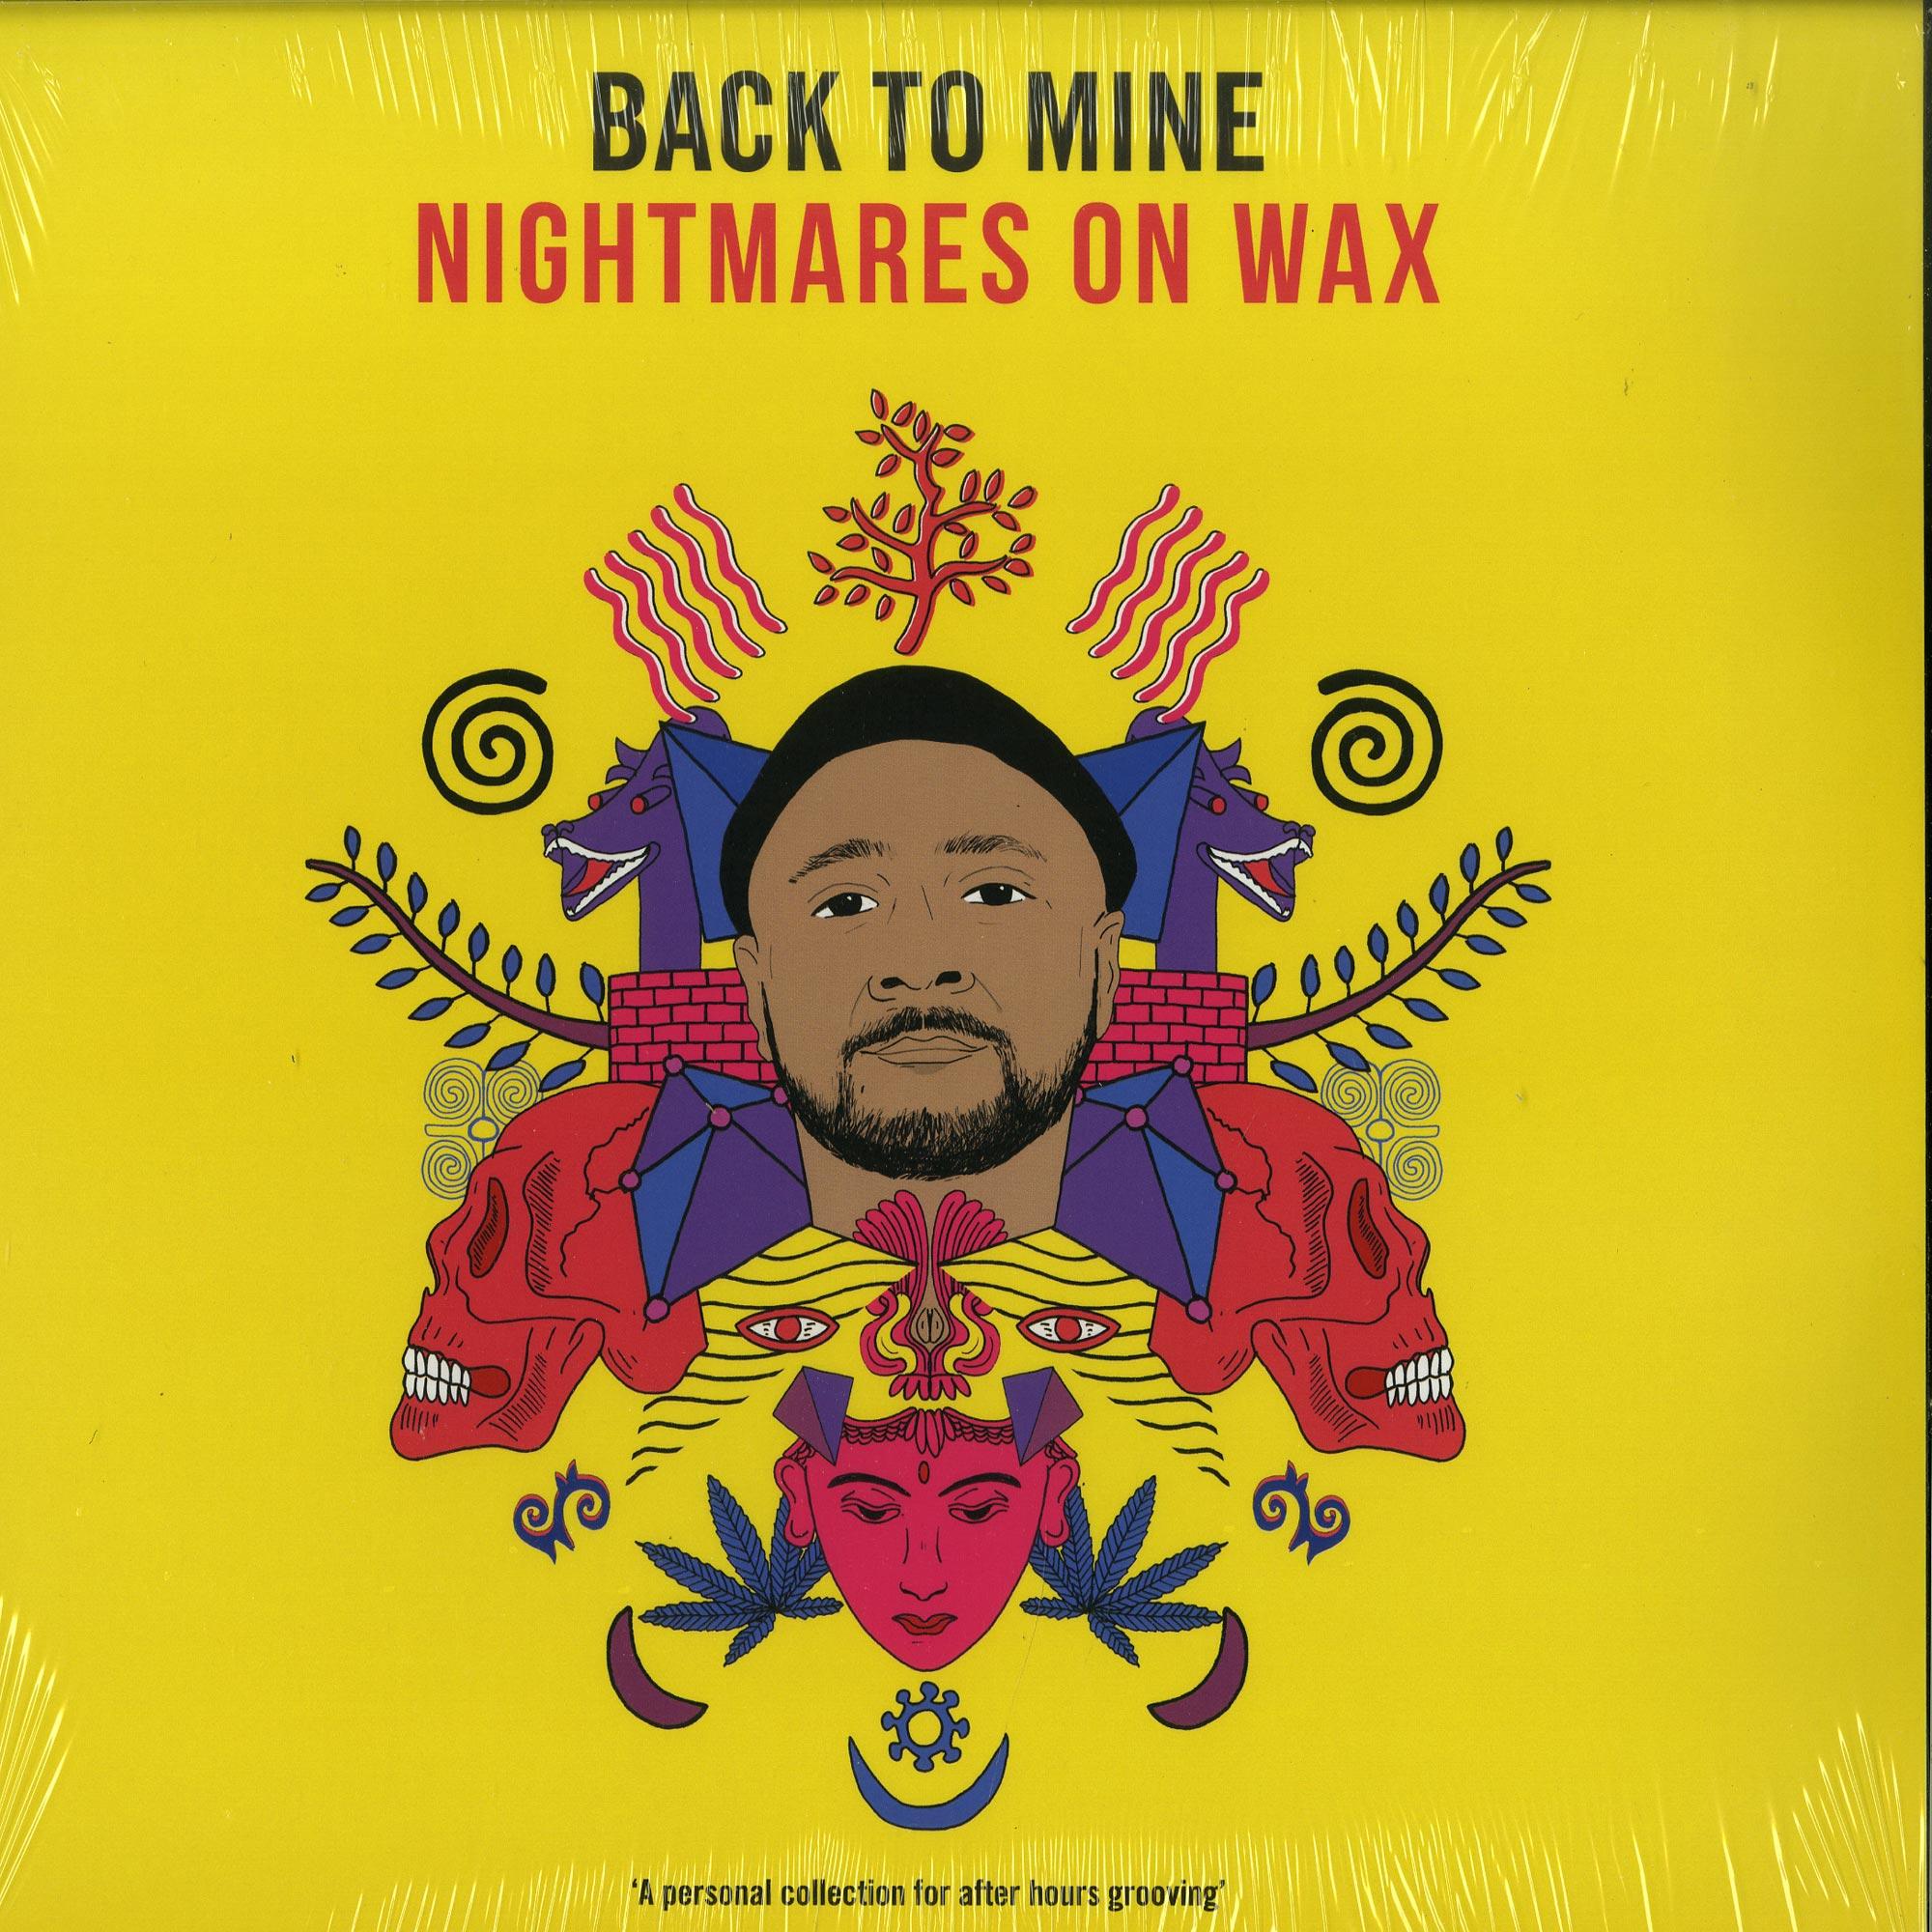 Nightmares On Wax Presents - BACK TO MINE